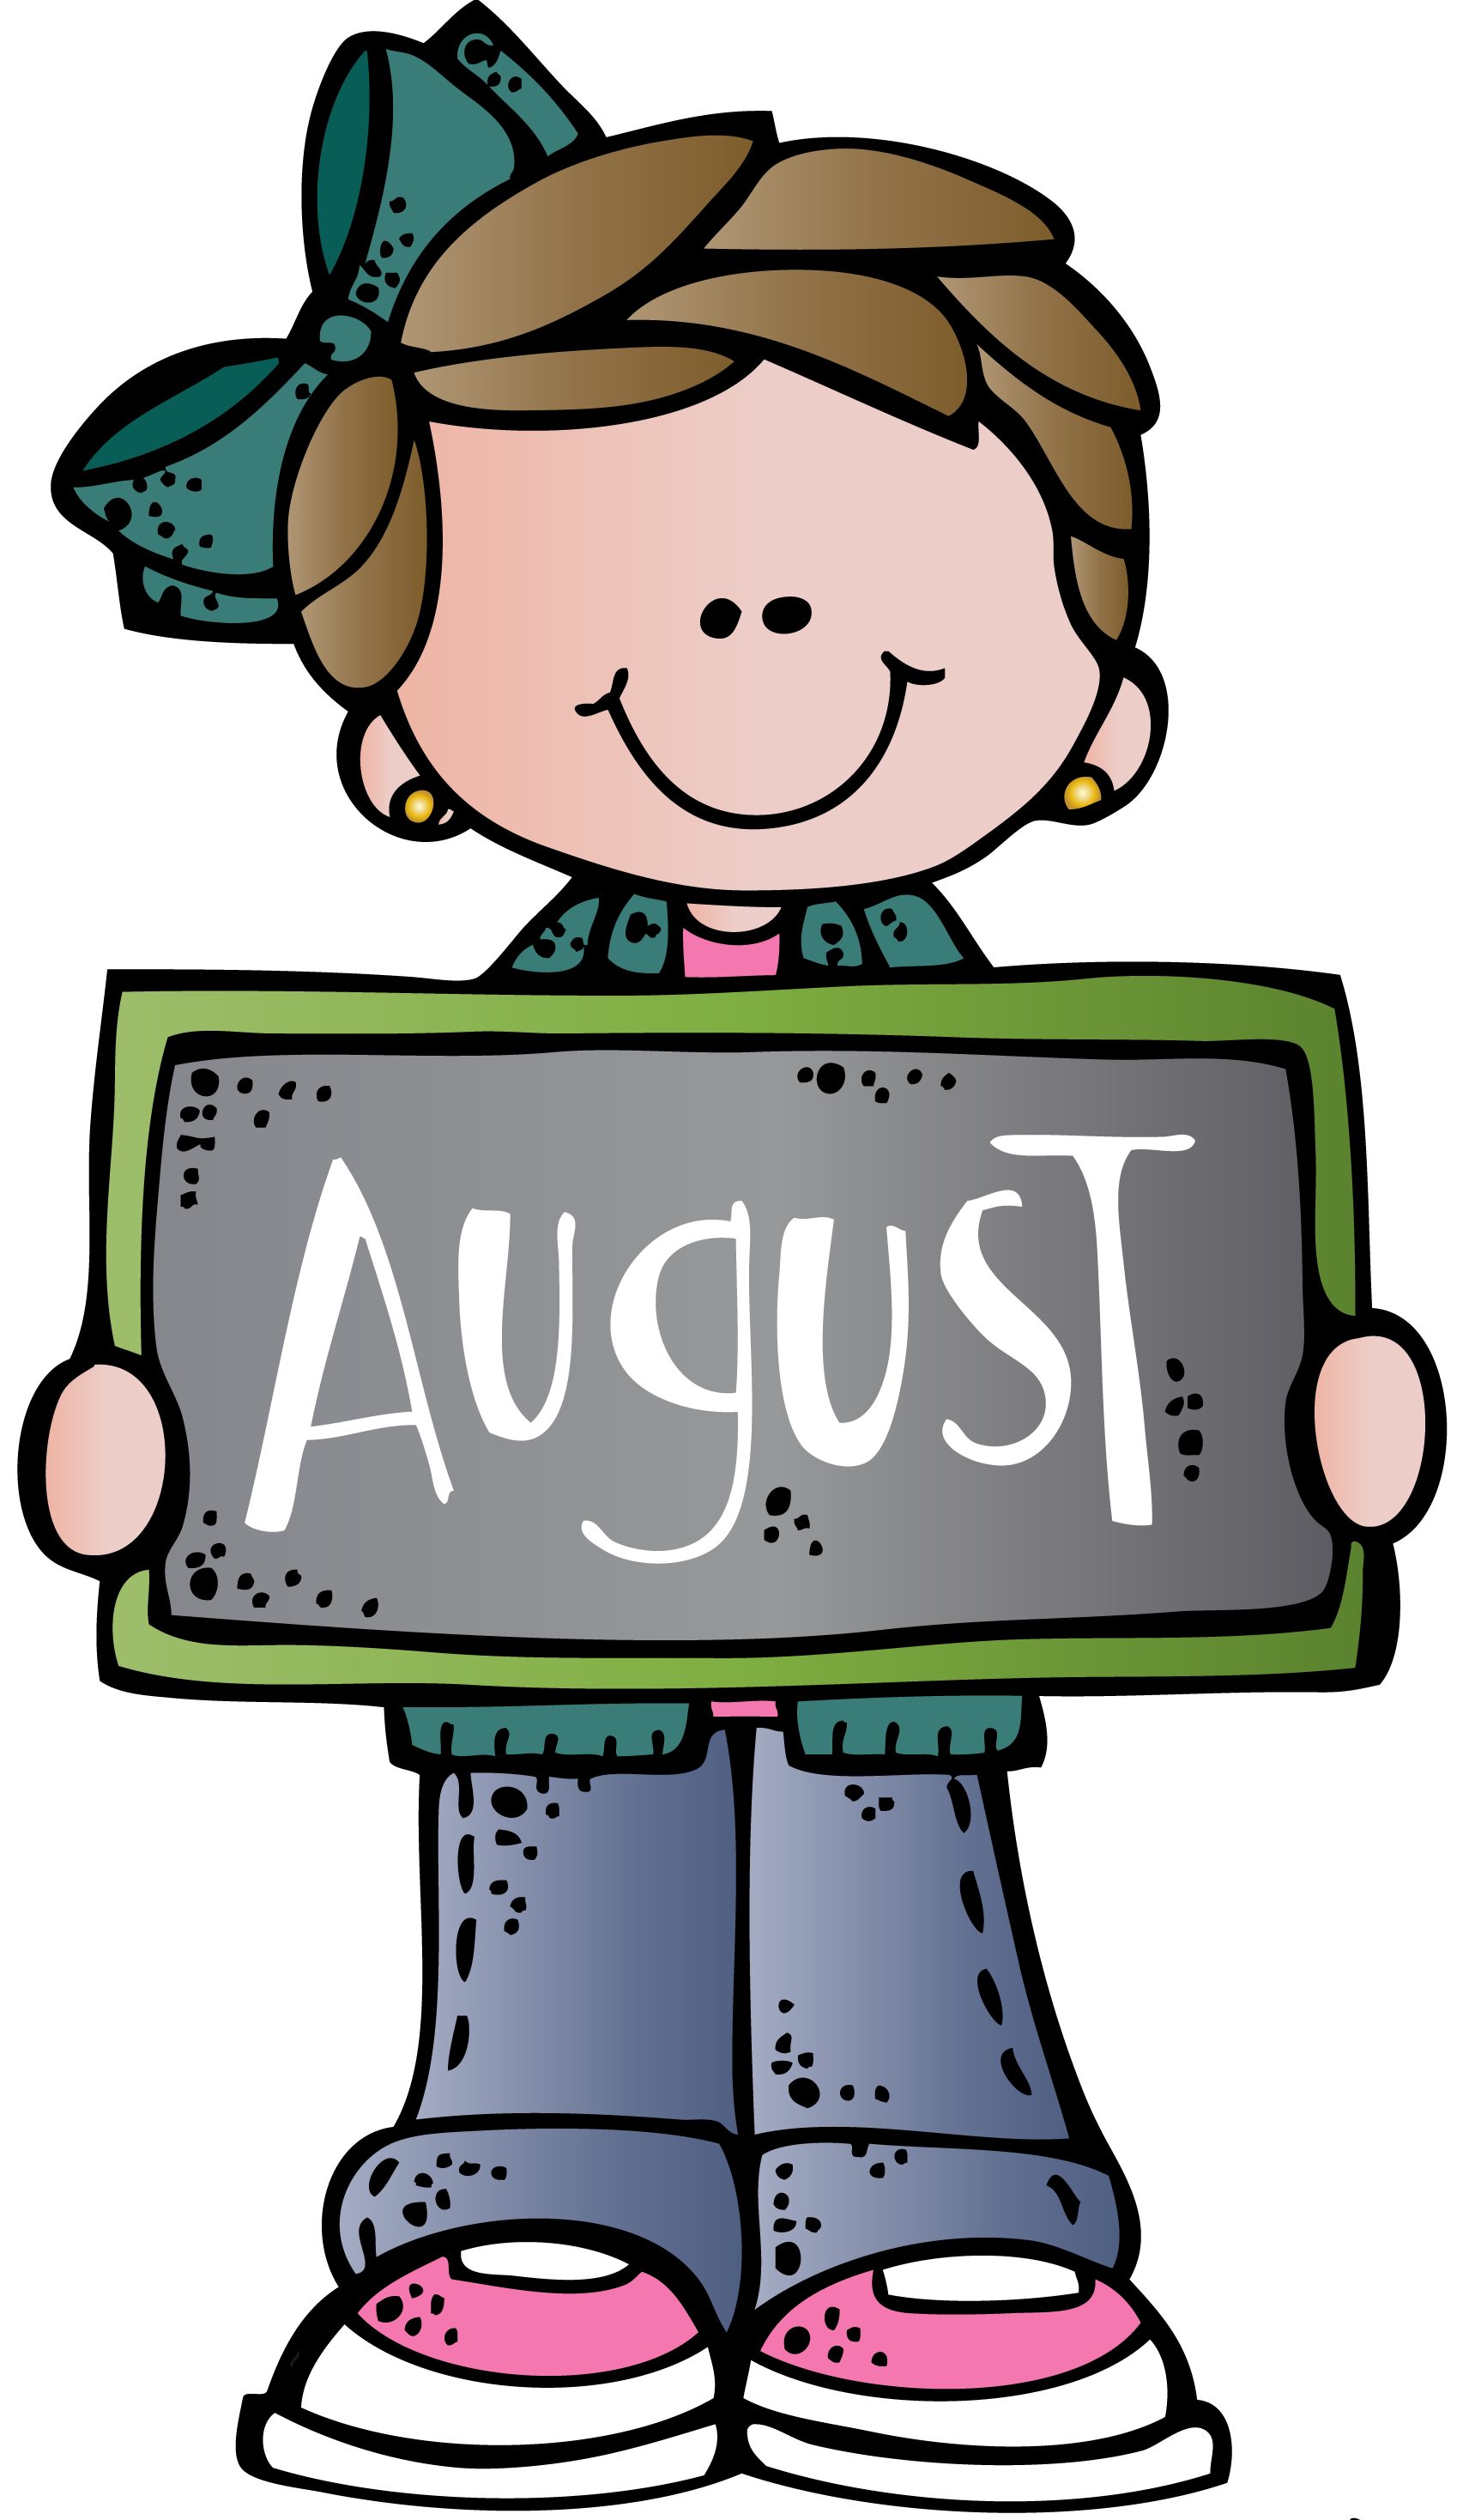 August clipart print.